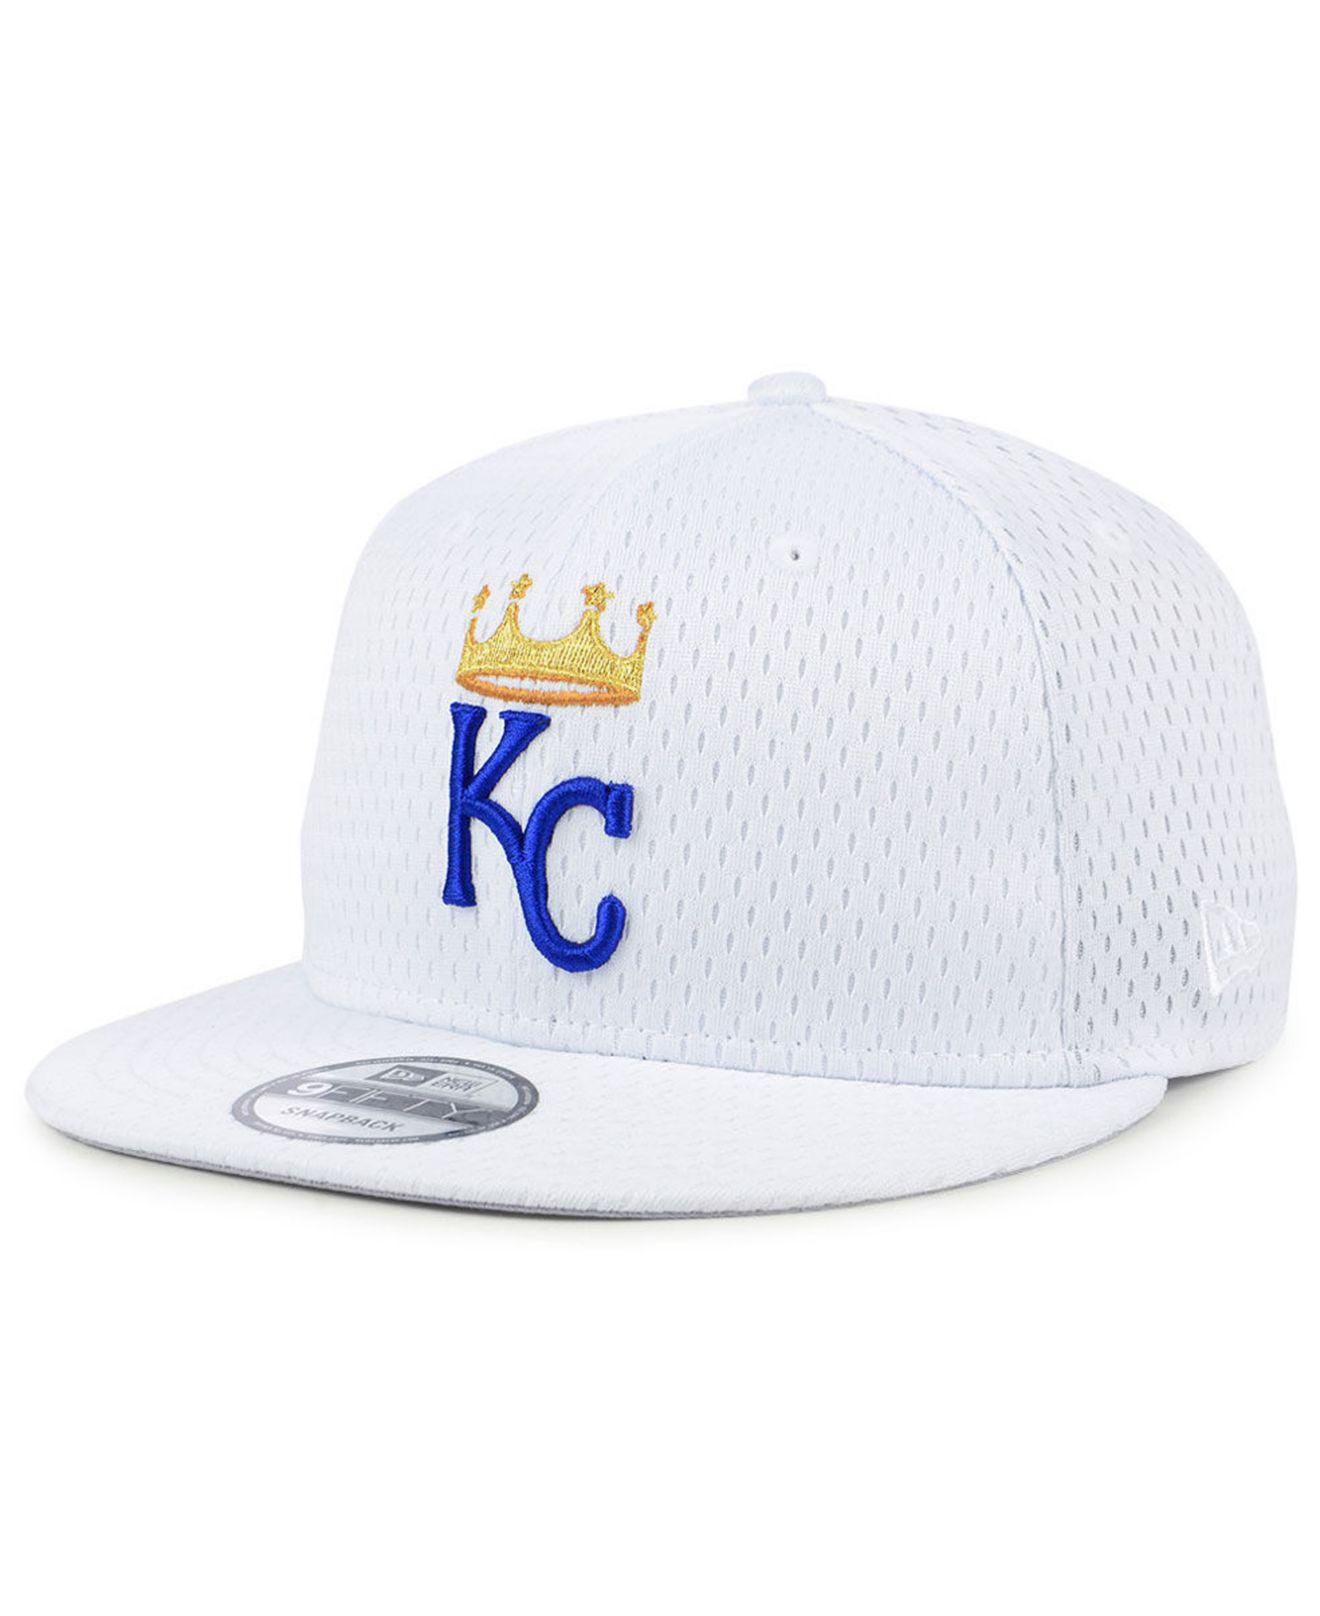 separation shoes cc9f8 543b7 KTZ Kansas City Royals Batting Practice Mesh 9fifty Snapback Cap in ...